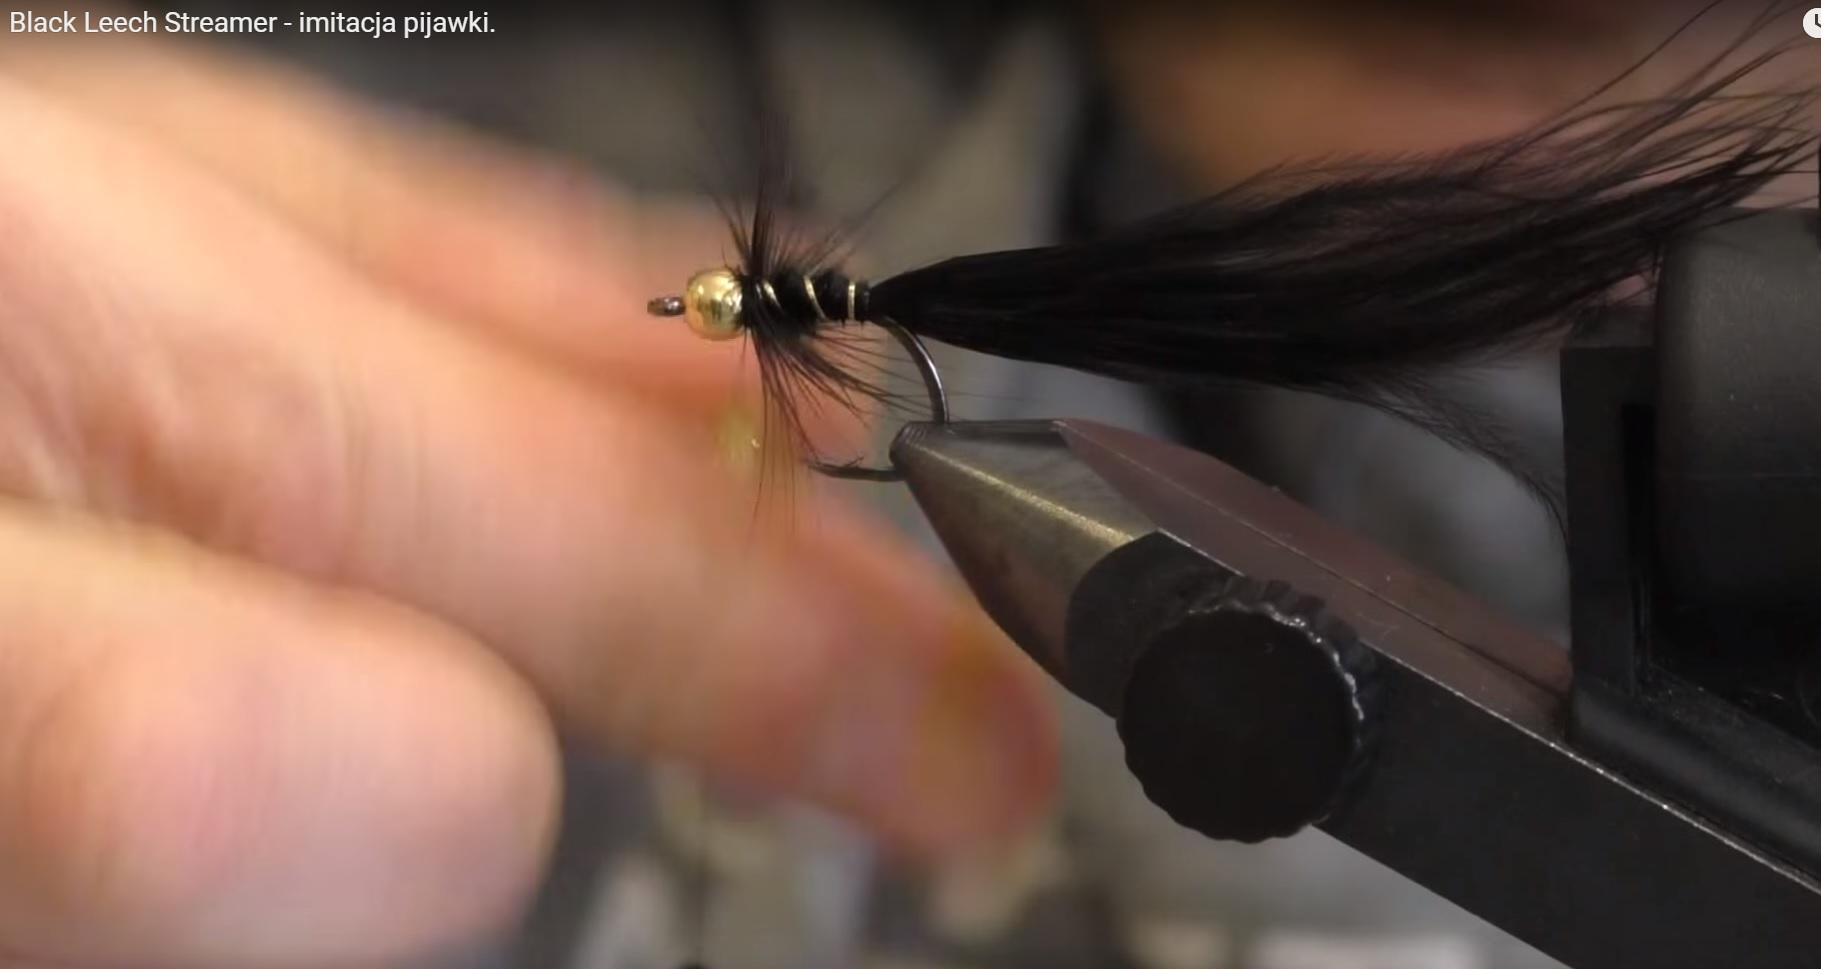 Black Leech Streamer – imitacja pijawki.